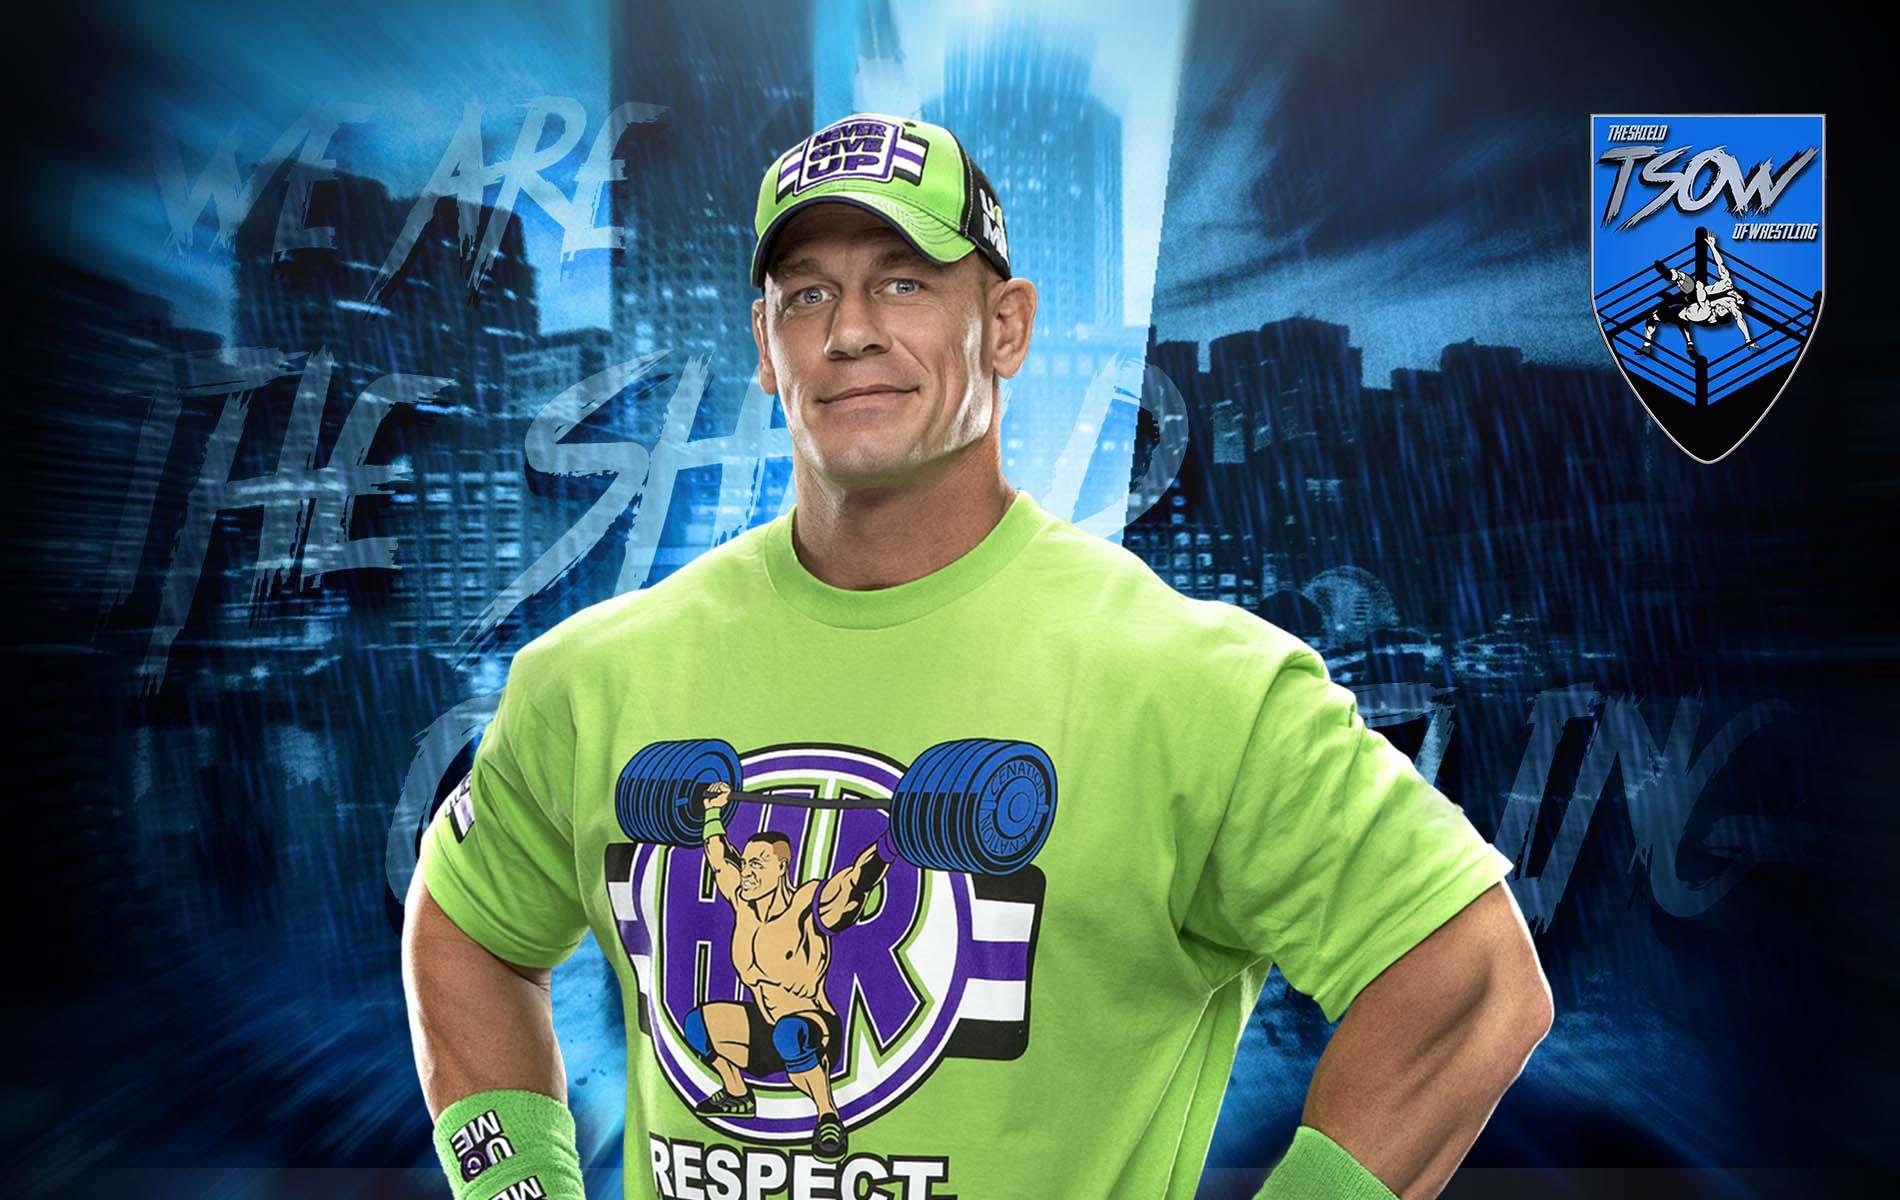 John Cena: quando potrà tornare in WWE?